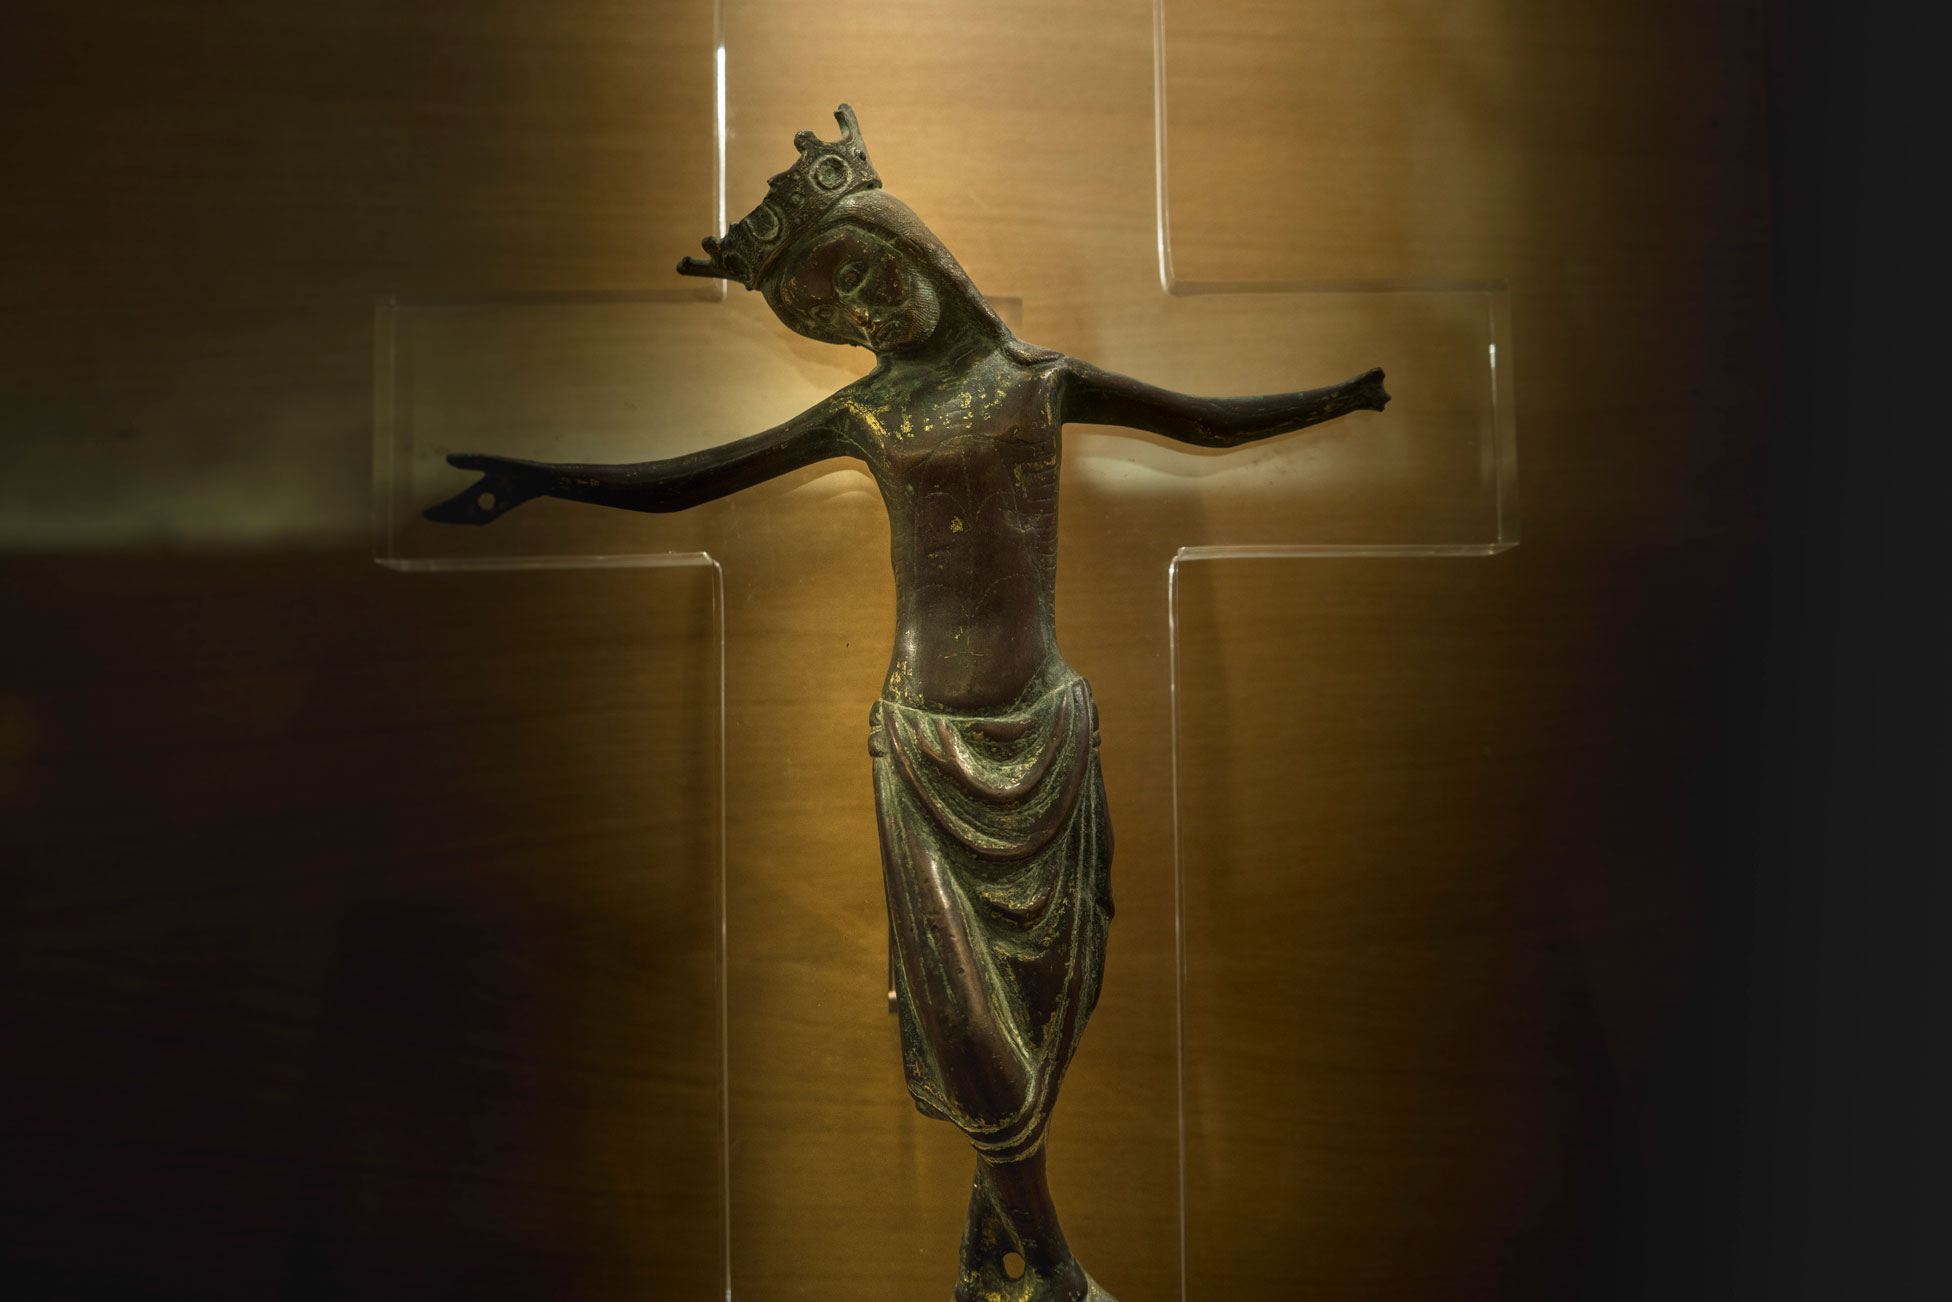 Cristo (românico, séc. XIII)